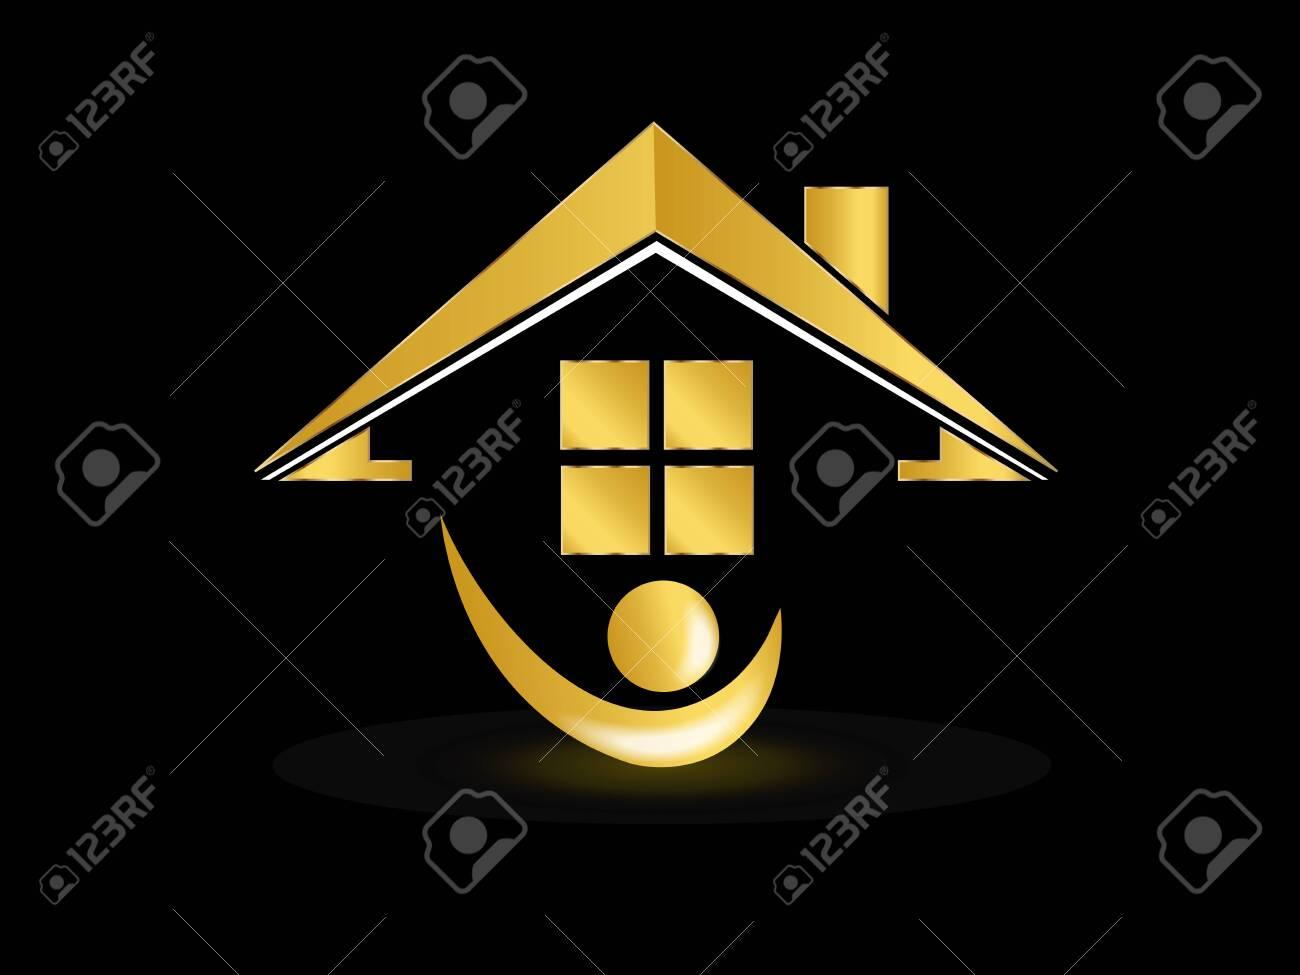 Real estate gold house people figure realtor logo icon vector image design template background illustration - 157430553